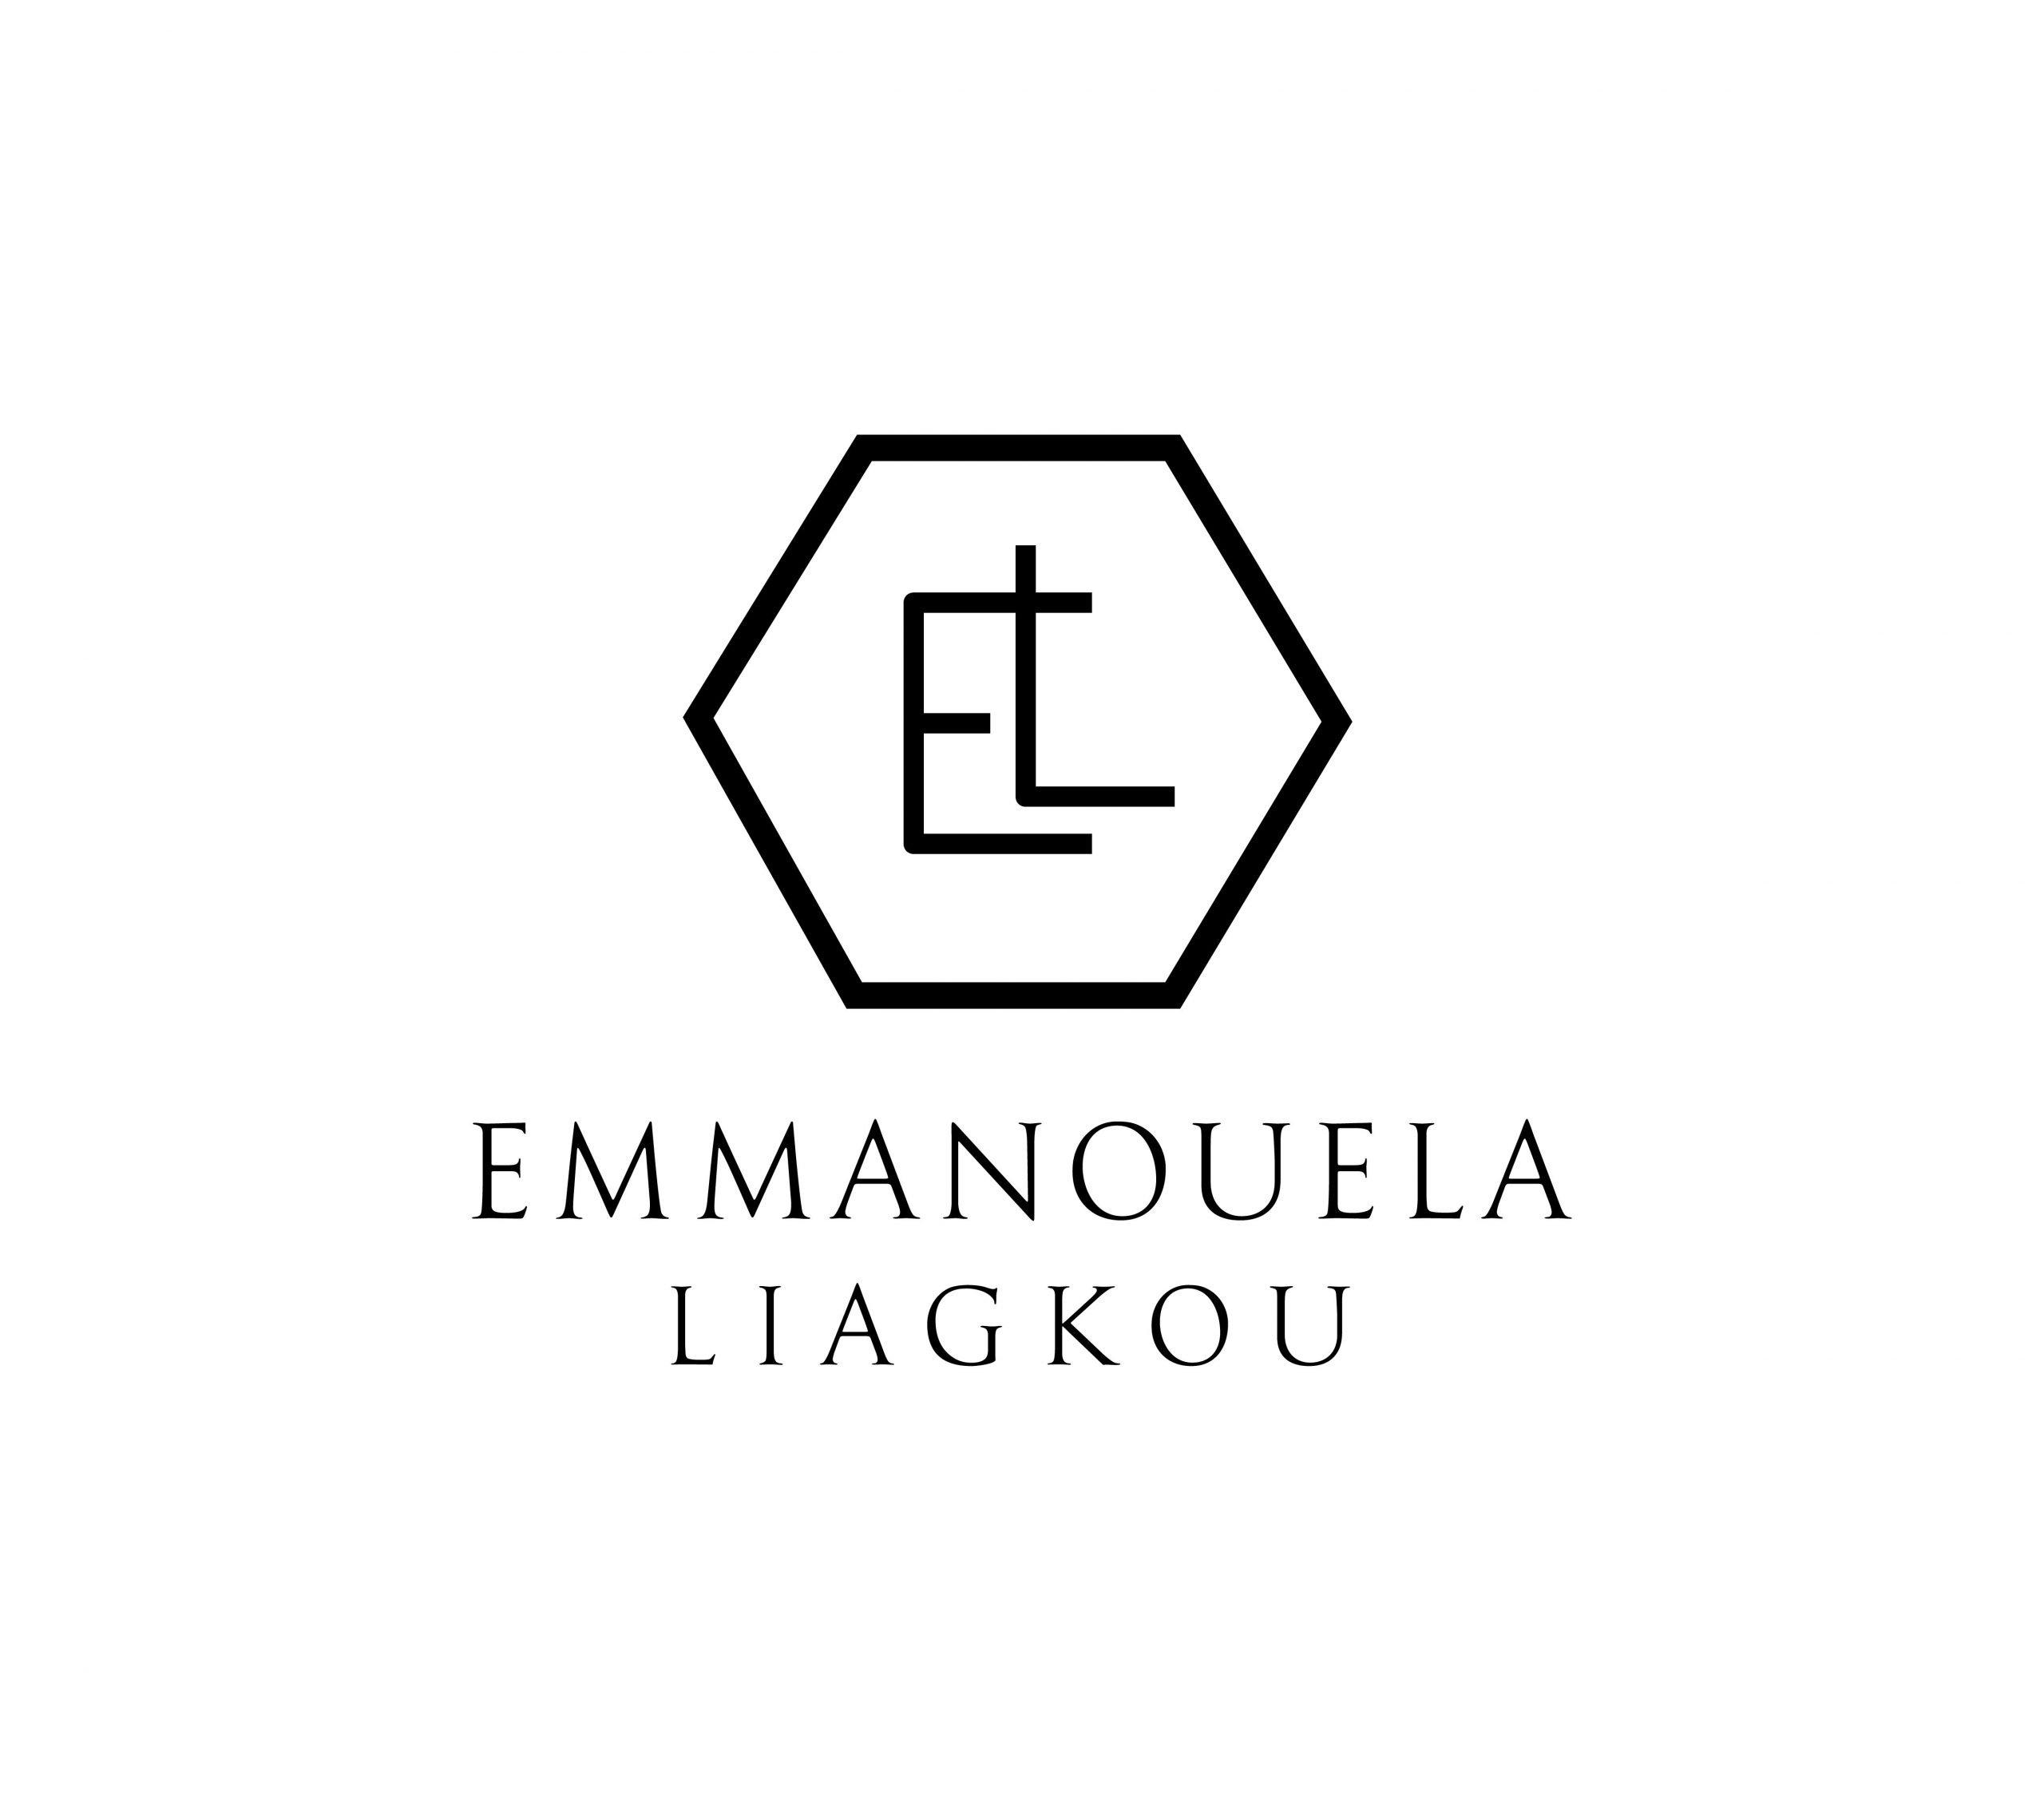 Emmanouela Liagkou